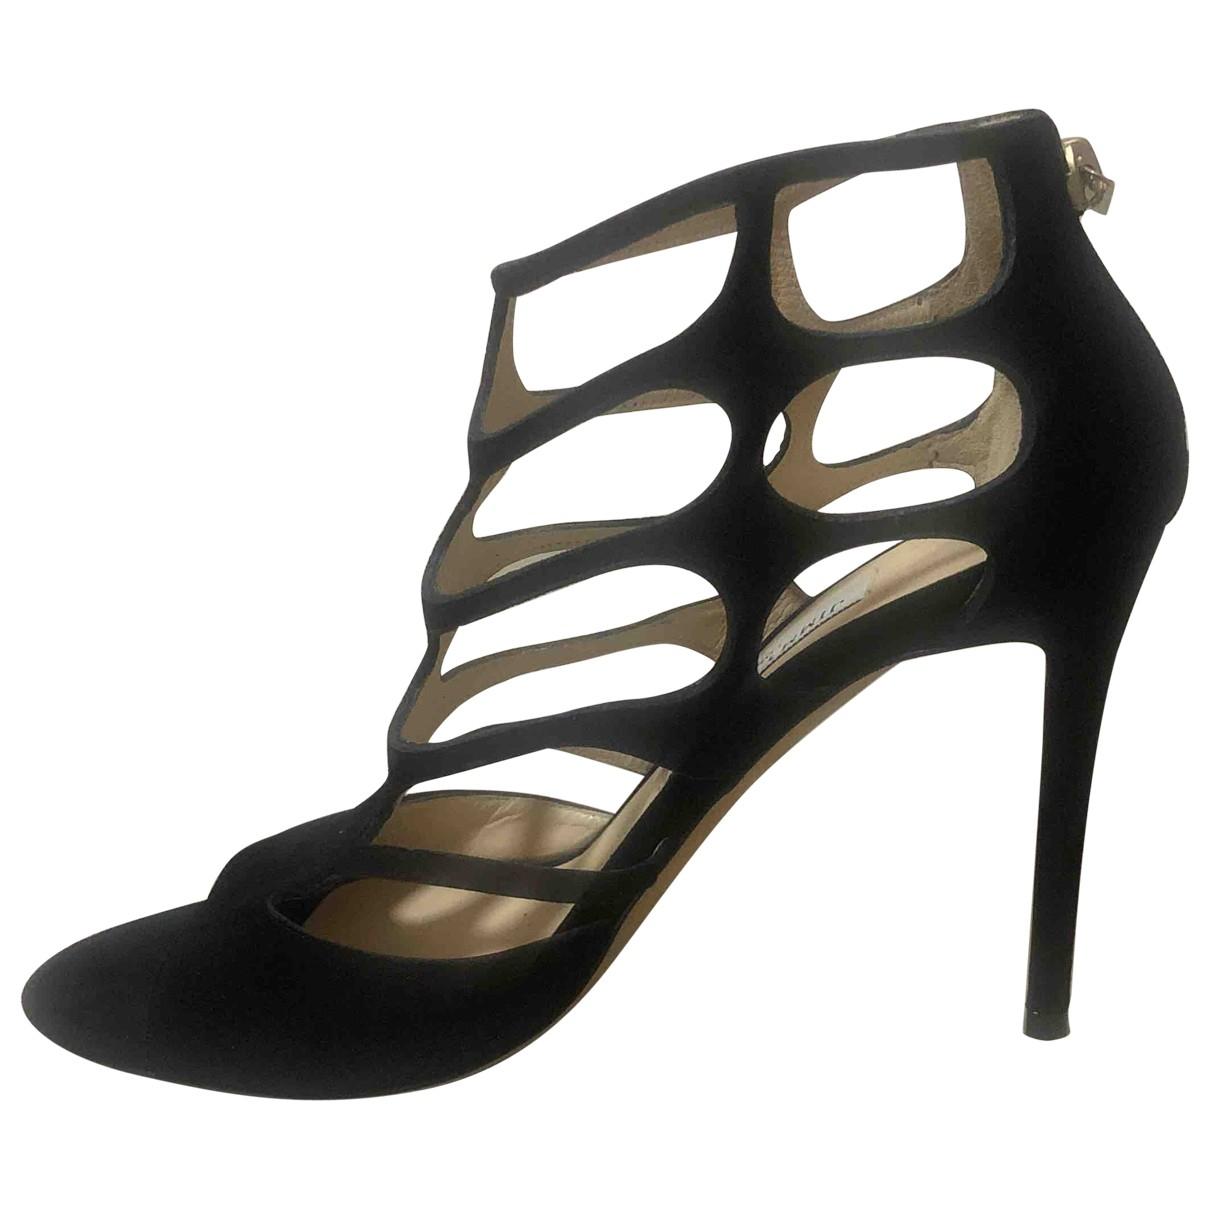 Jimmy Choo \N Black Suede Sandals for Women 39 EU